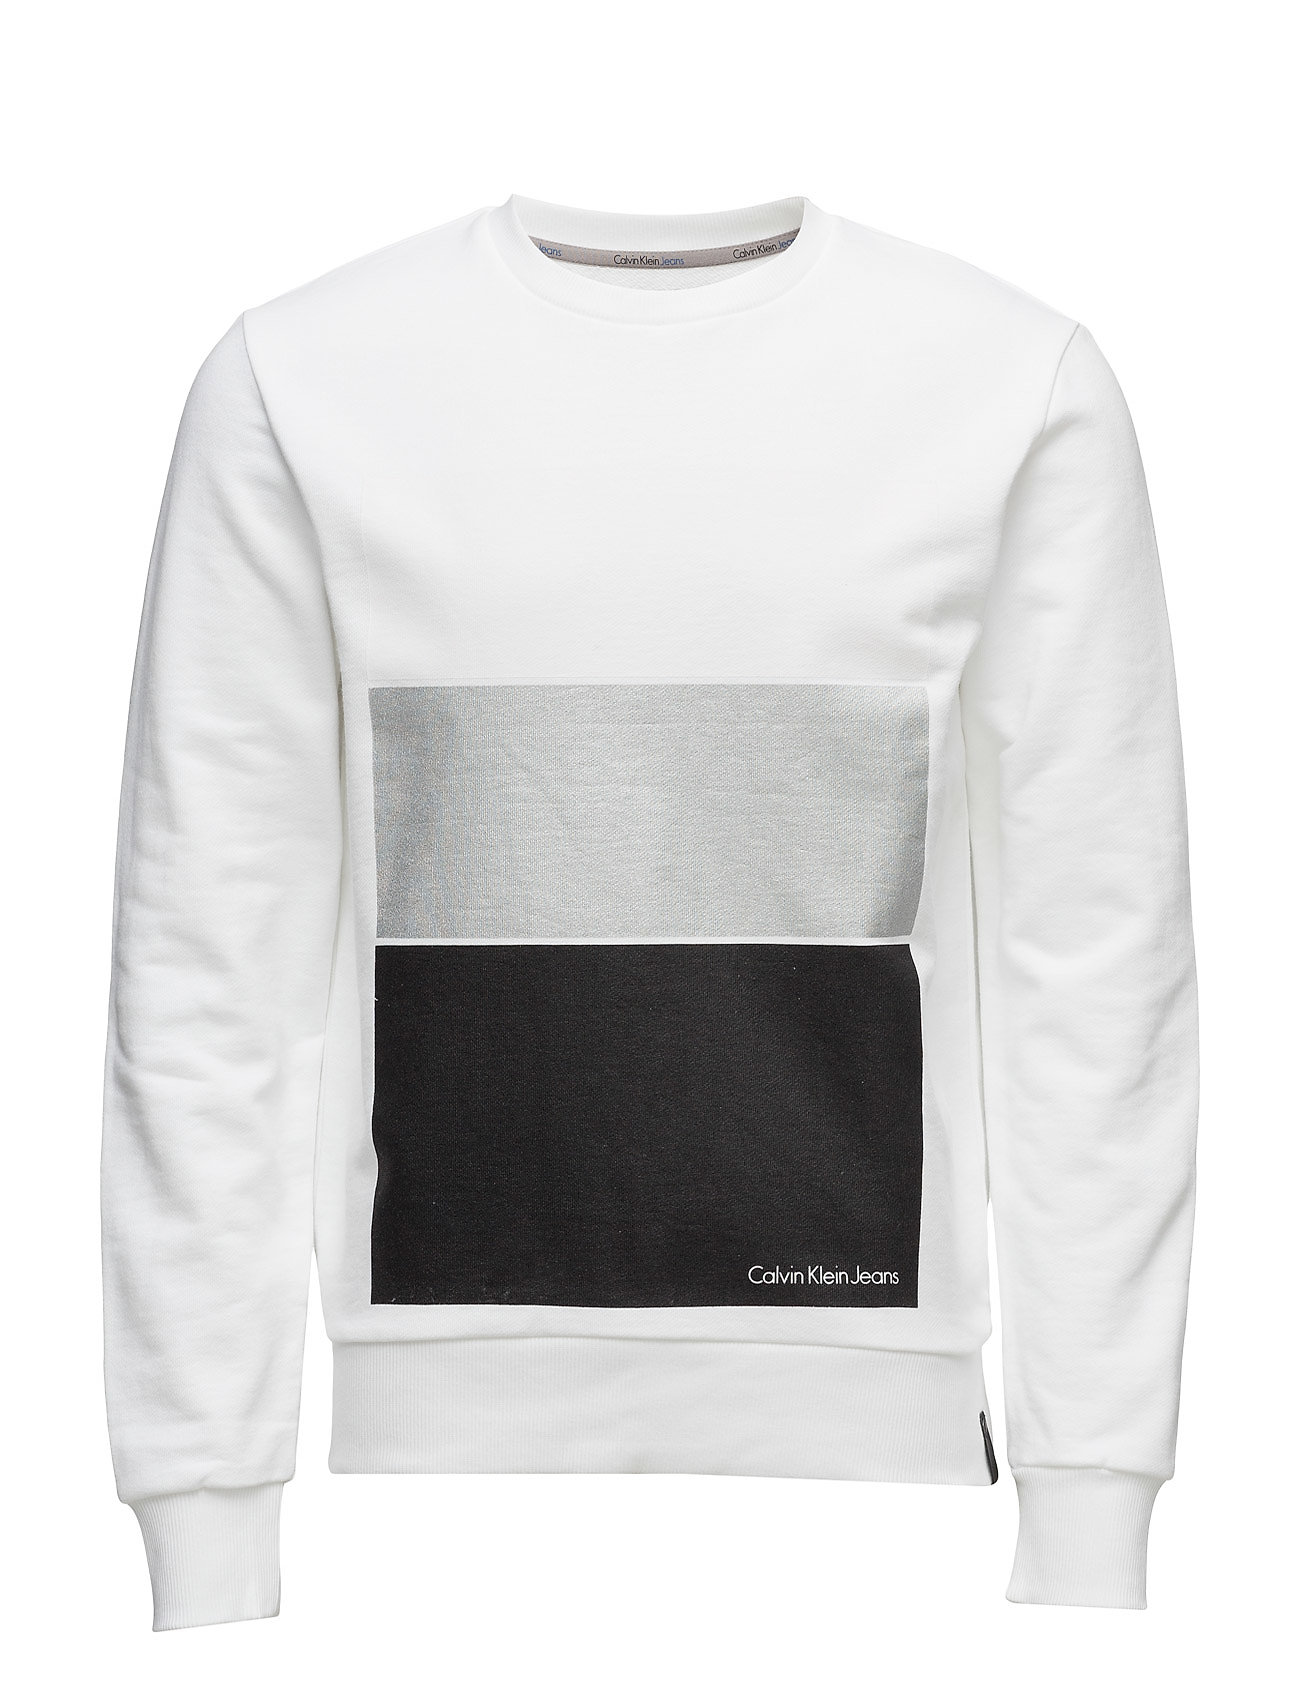 calvin klein jeans – Hilex 2 cn hknit ls, fra boozt.com dk